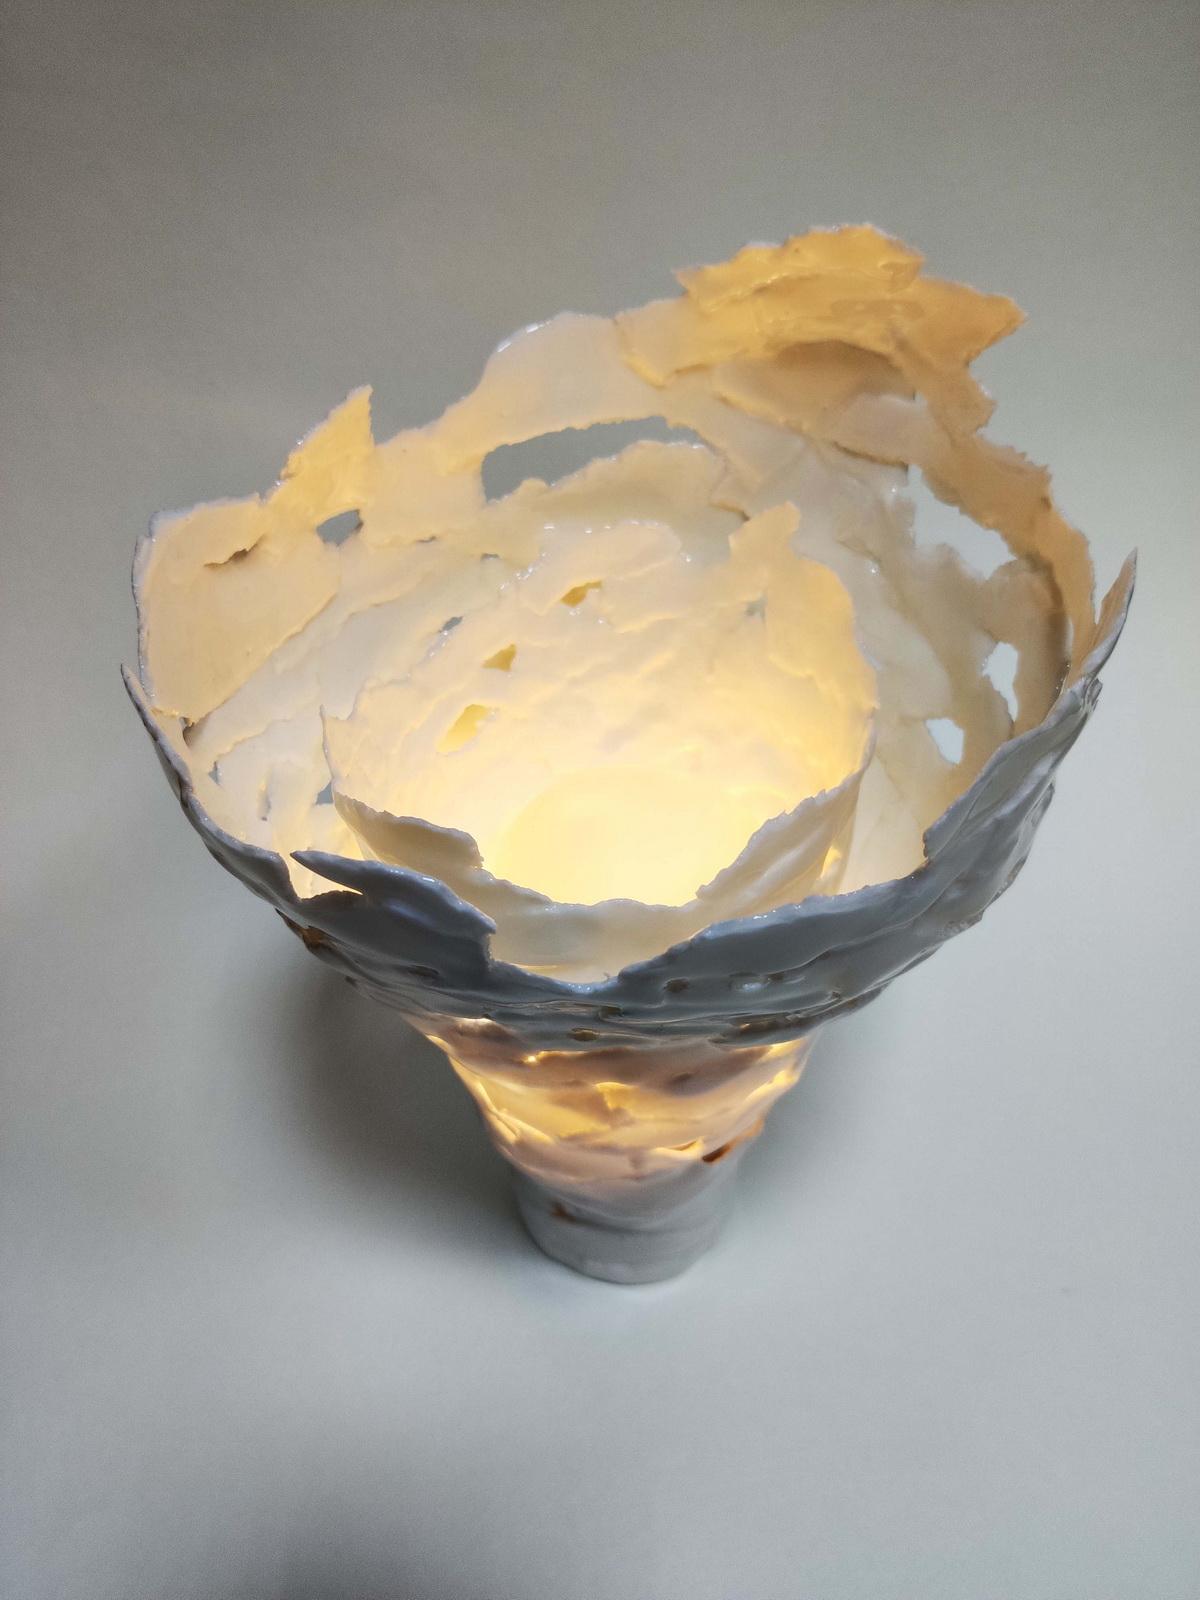 Наталия Хлебцевич. Белый ветер, 2021. Фарфор, 18х18х25 Courtesy of the East Meets West Gallery